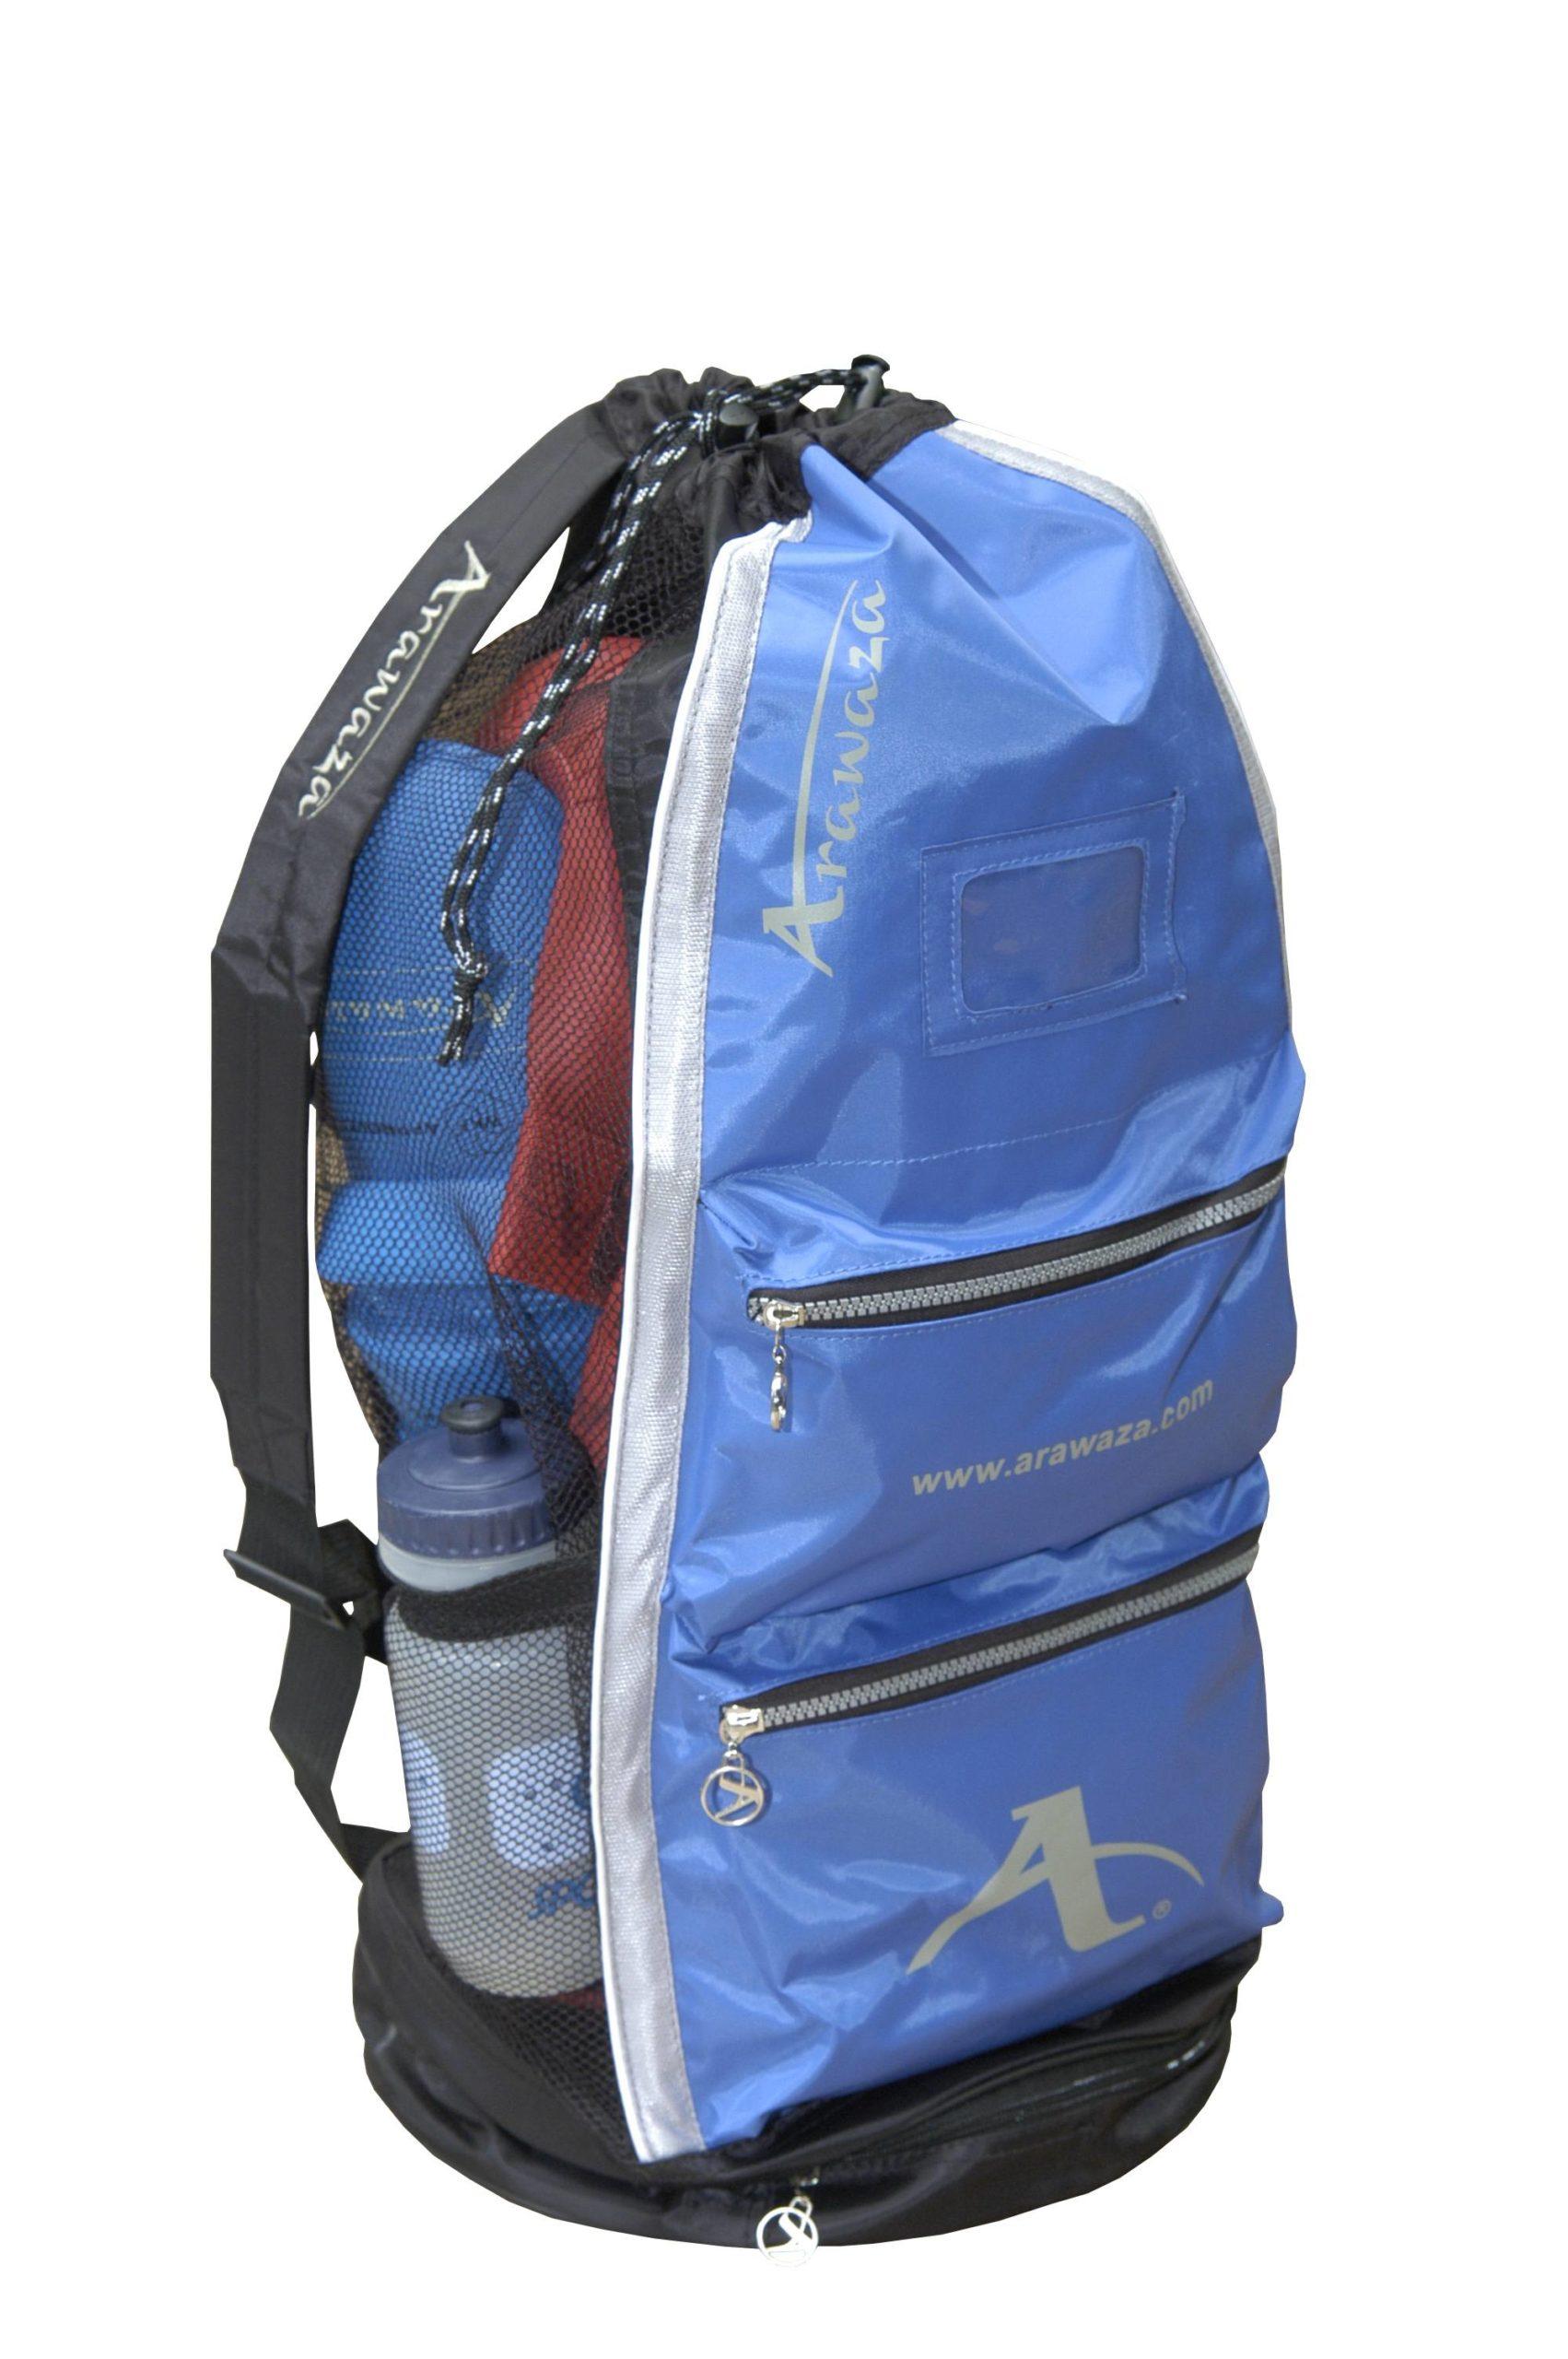 Arawaza Gear Bag